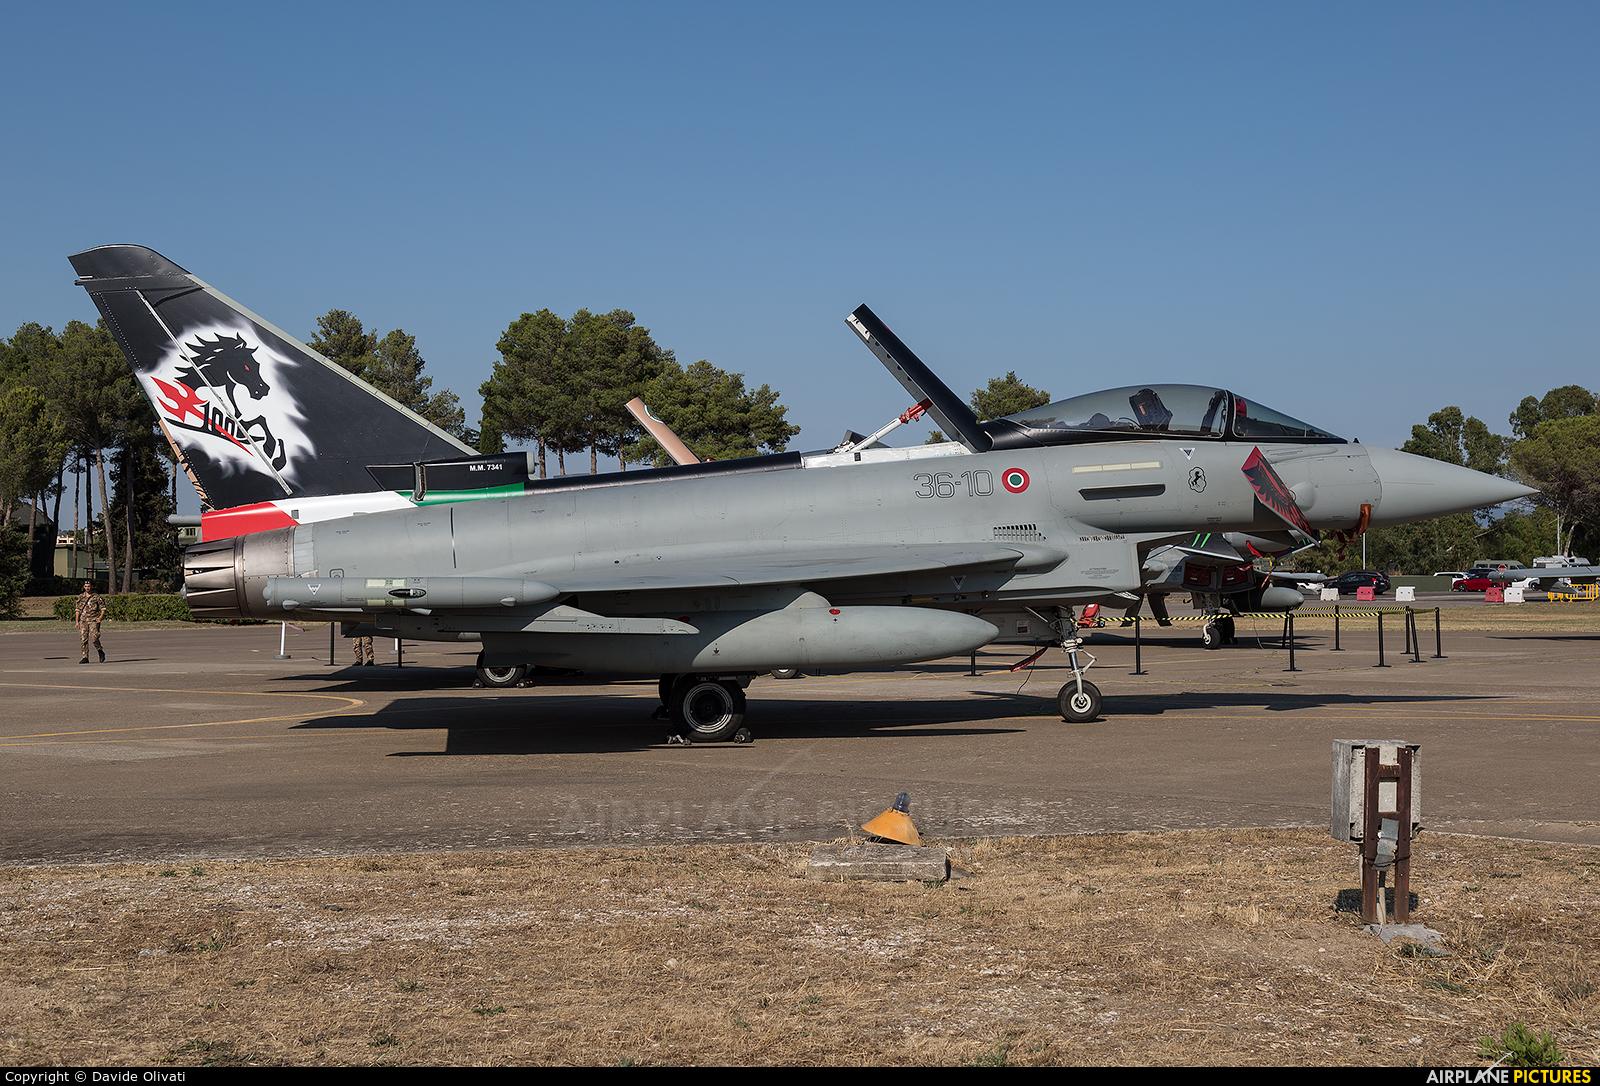 Italy - Air Force MM7341 aircraft at Grosseto - Corrado Baccarini